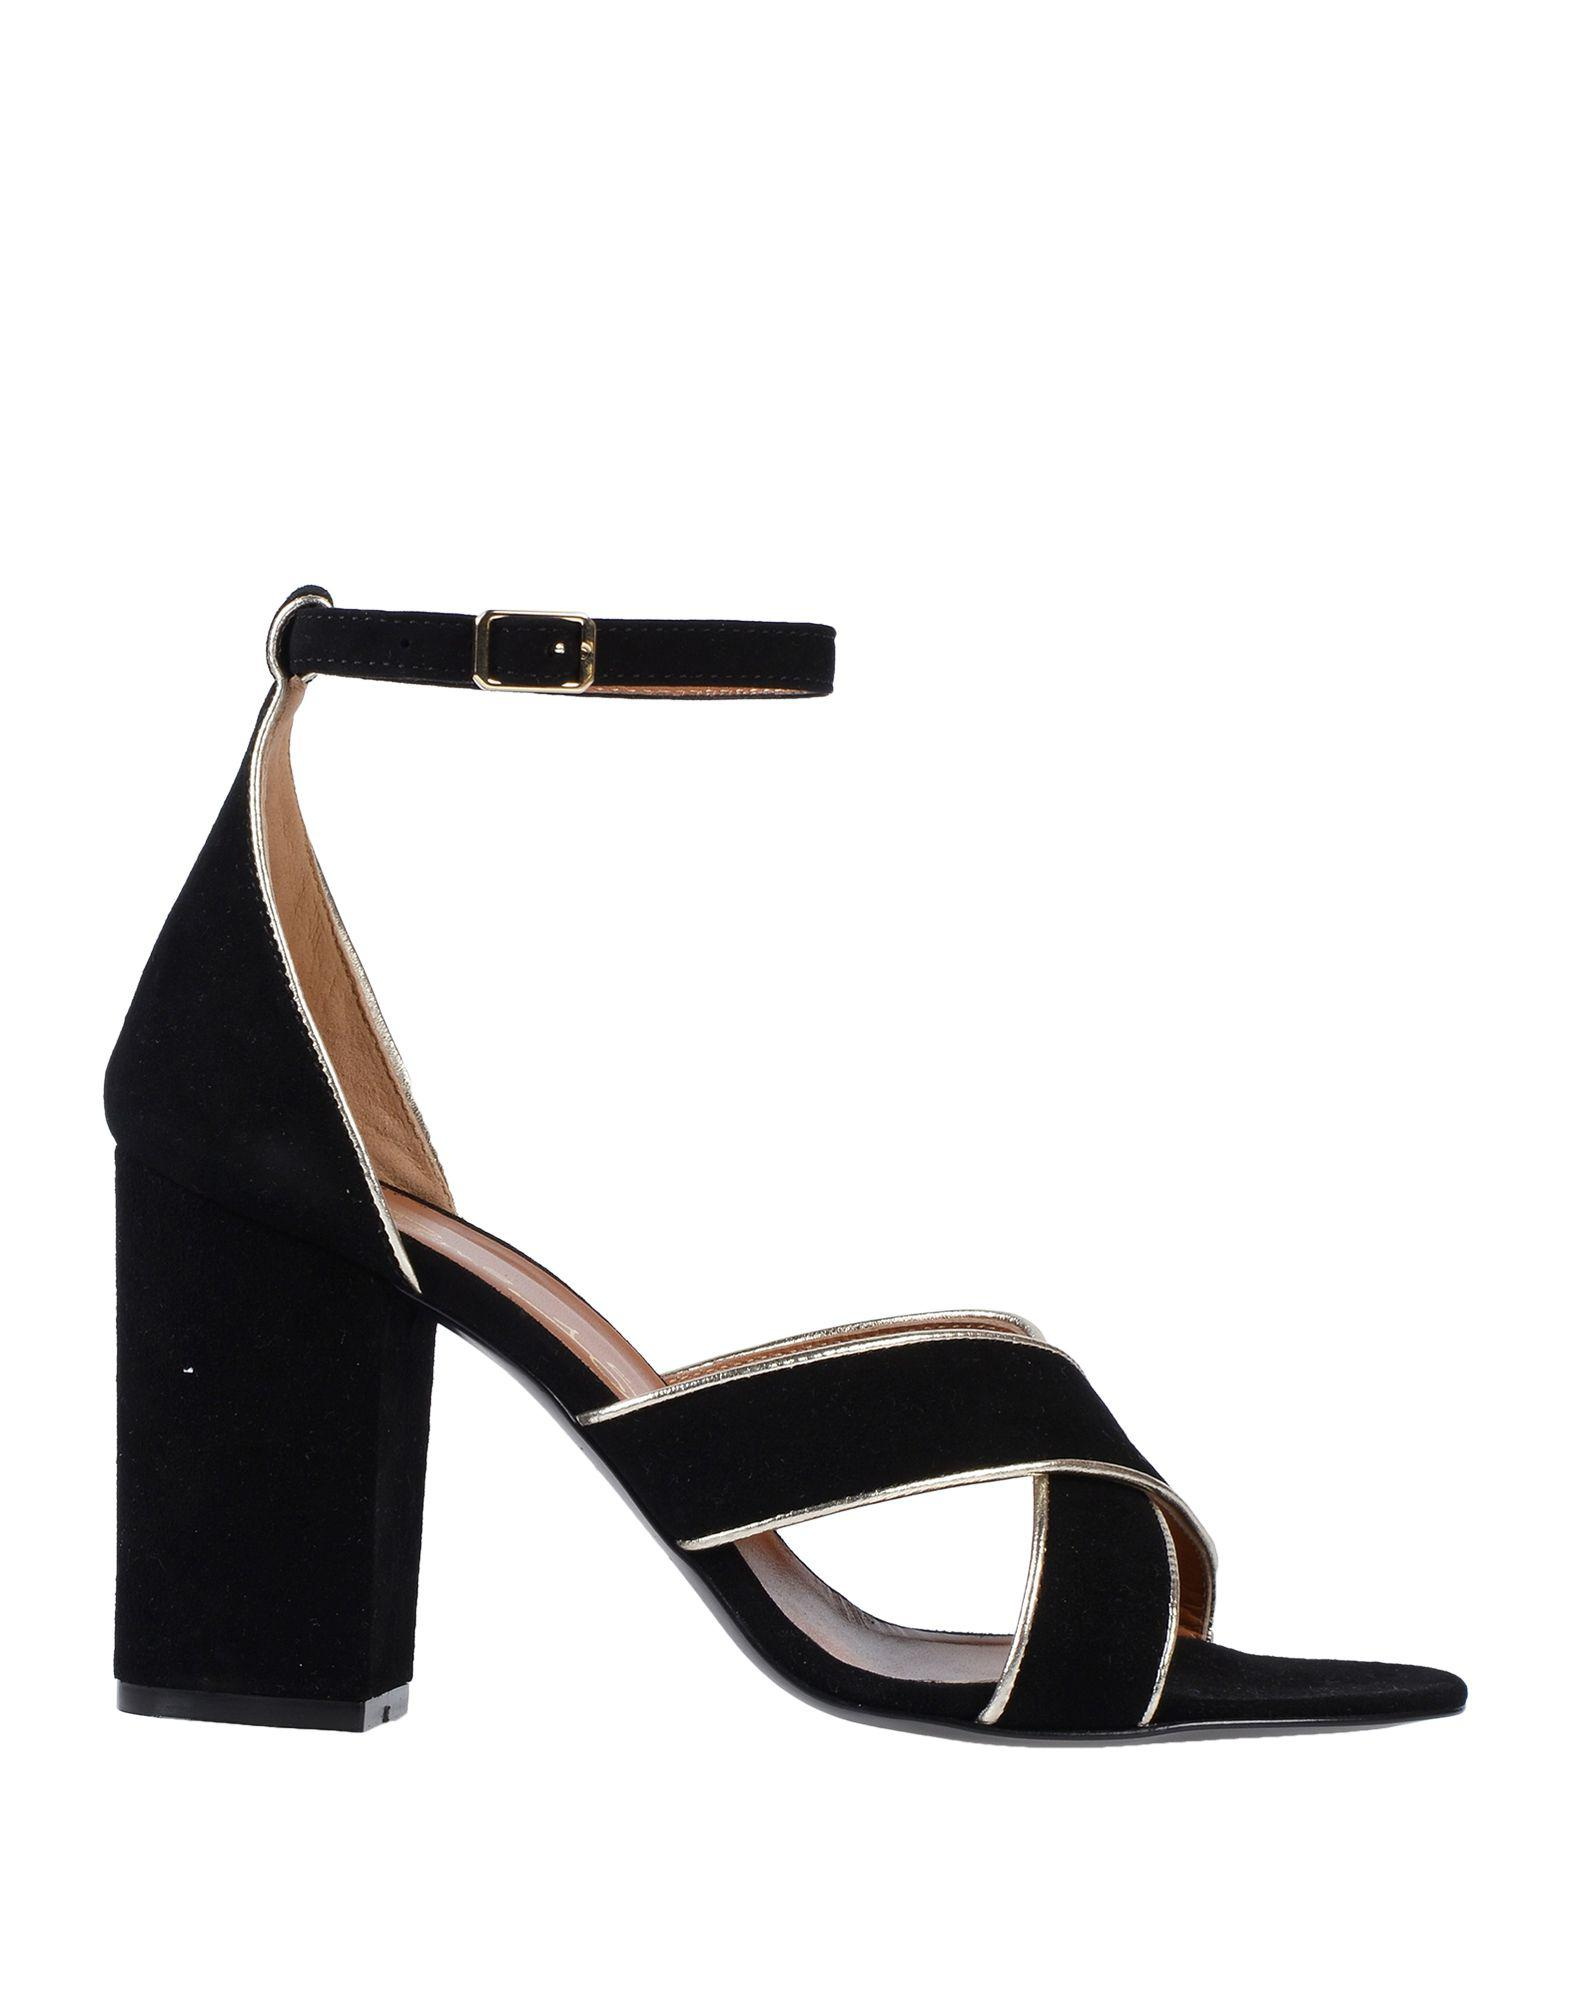 c43df94a5597f Lyst - Via Roma 15 Sandals in Black